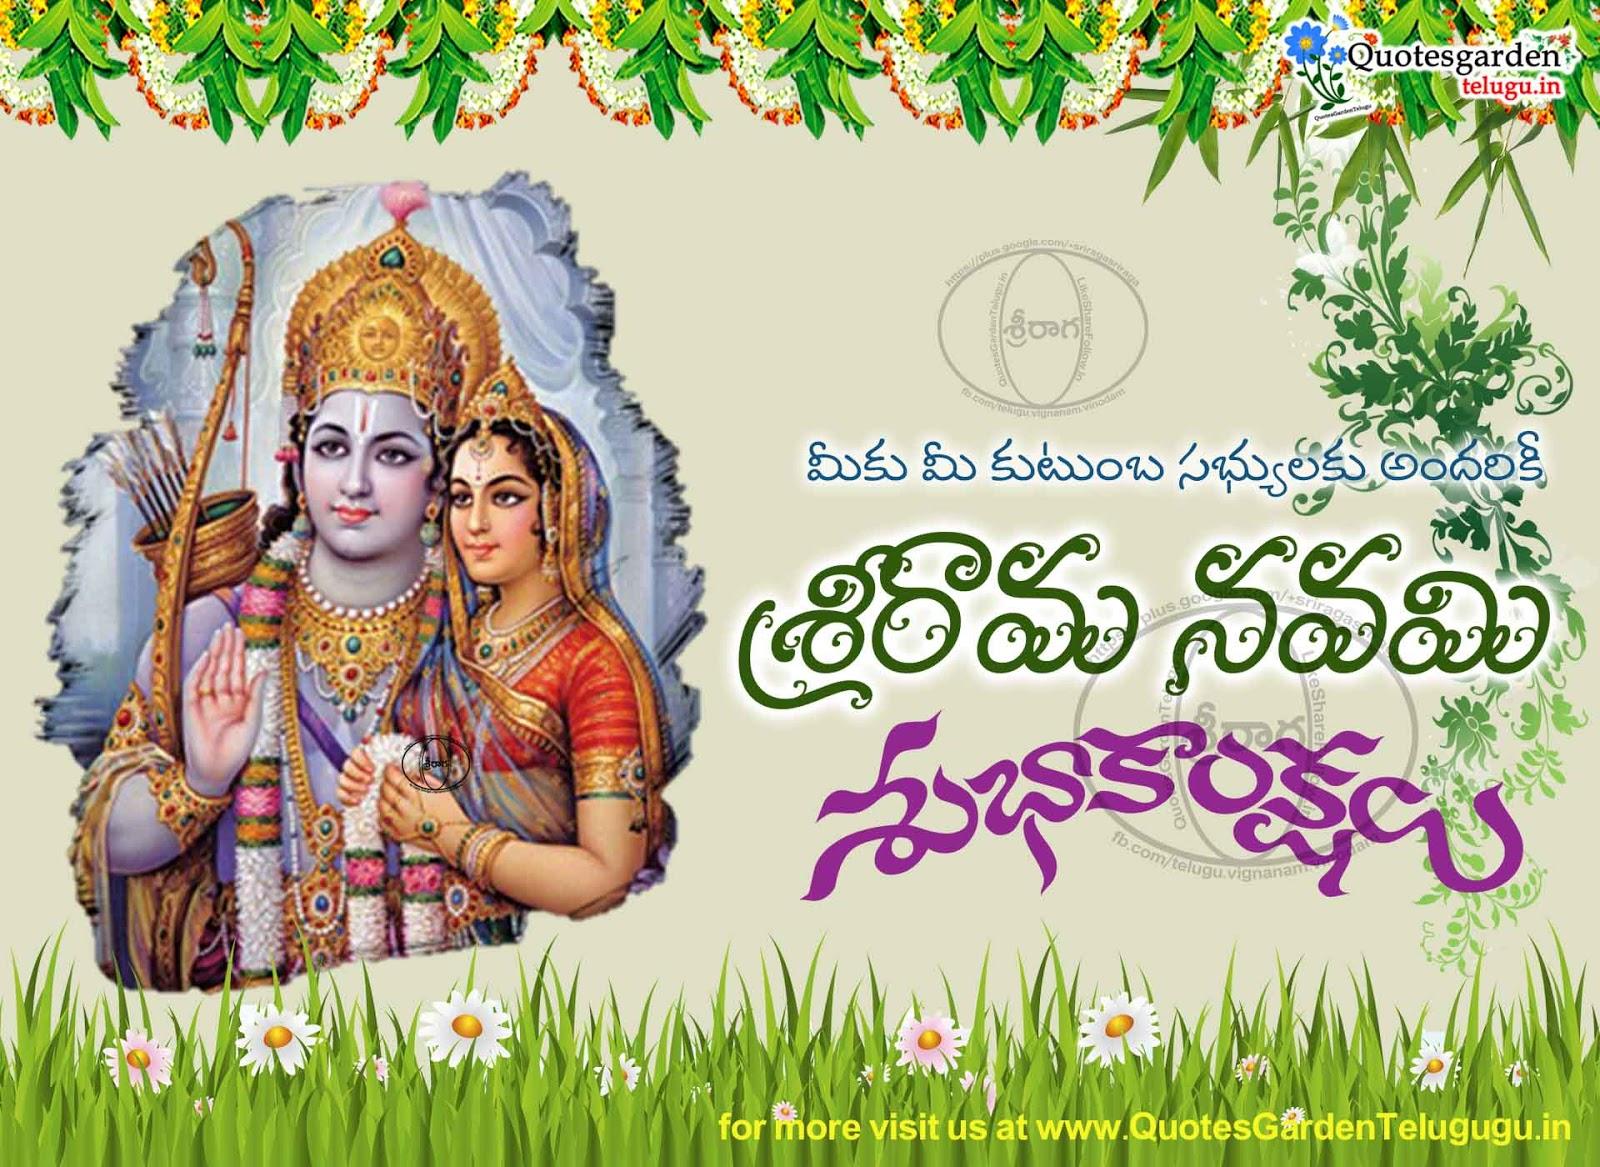 Sri rama navami wishes greetings in telugu ram navami images sms srir rama navami telugu wishes sri rama navami images m4hsunfo